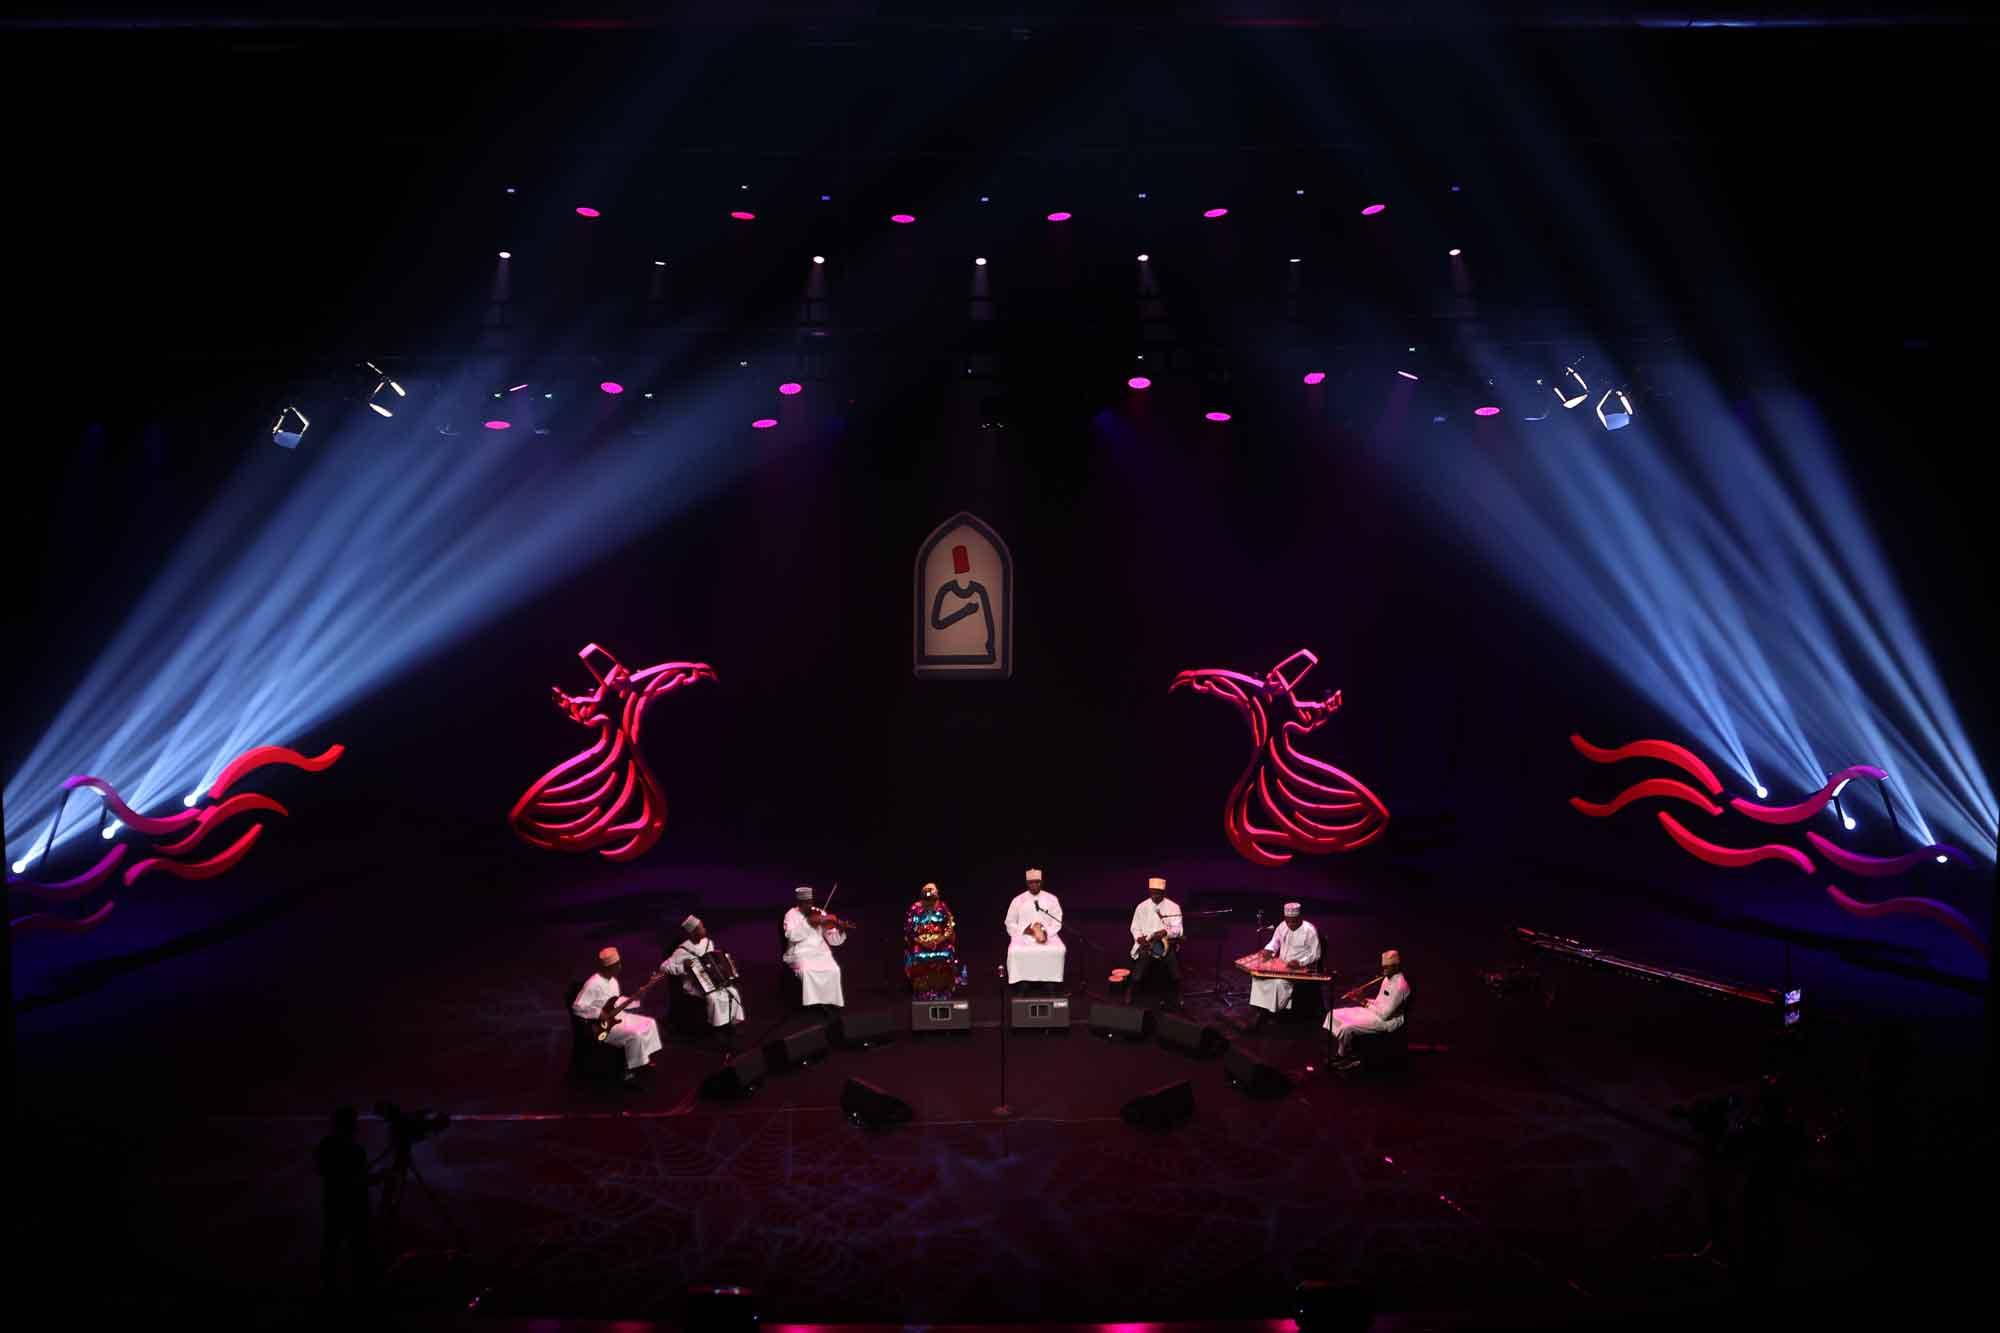 tanzanyadan-rajab-suleiman-konyada-konser-verdi.jpg